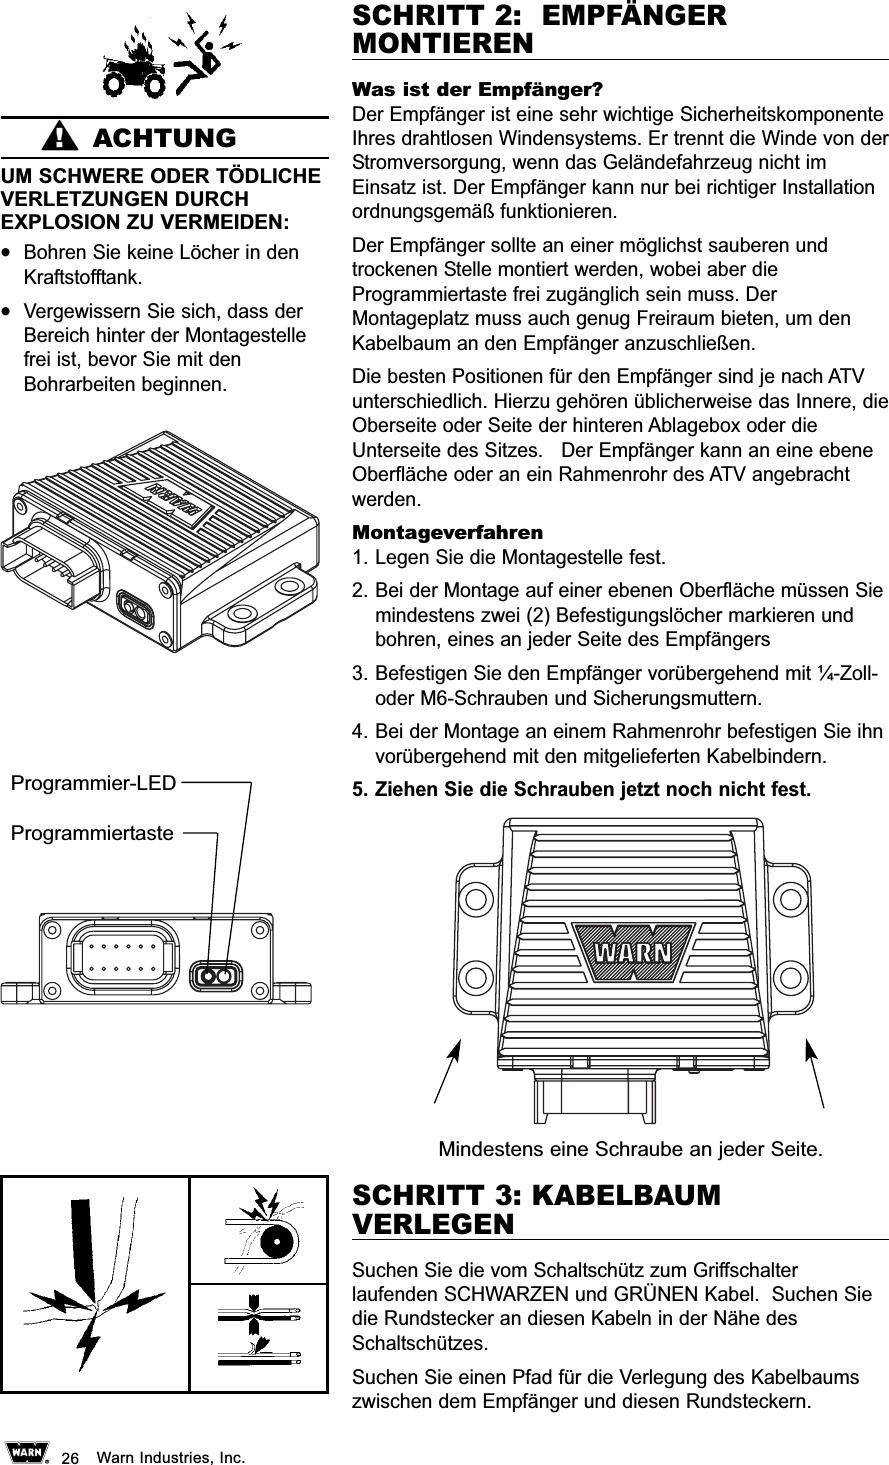 Großzügig 8274 Warn Winde Schaltplan Galerie - Verdrahtungsideen ...